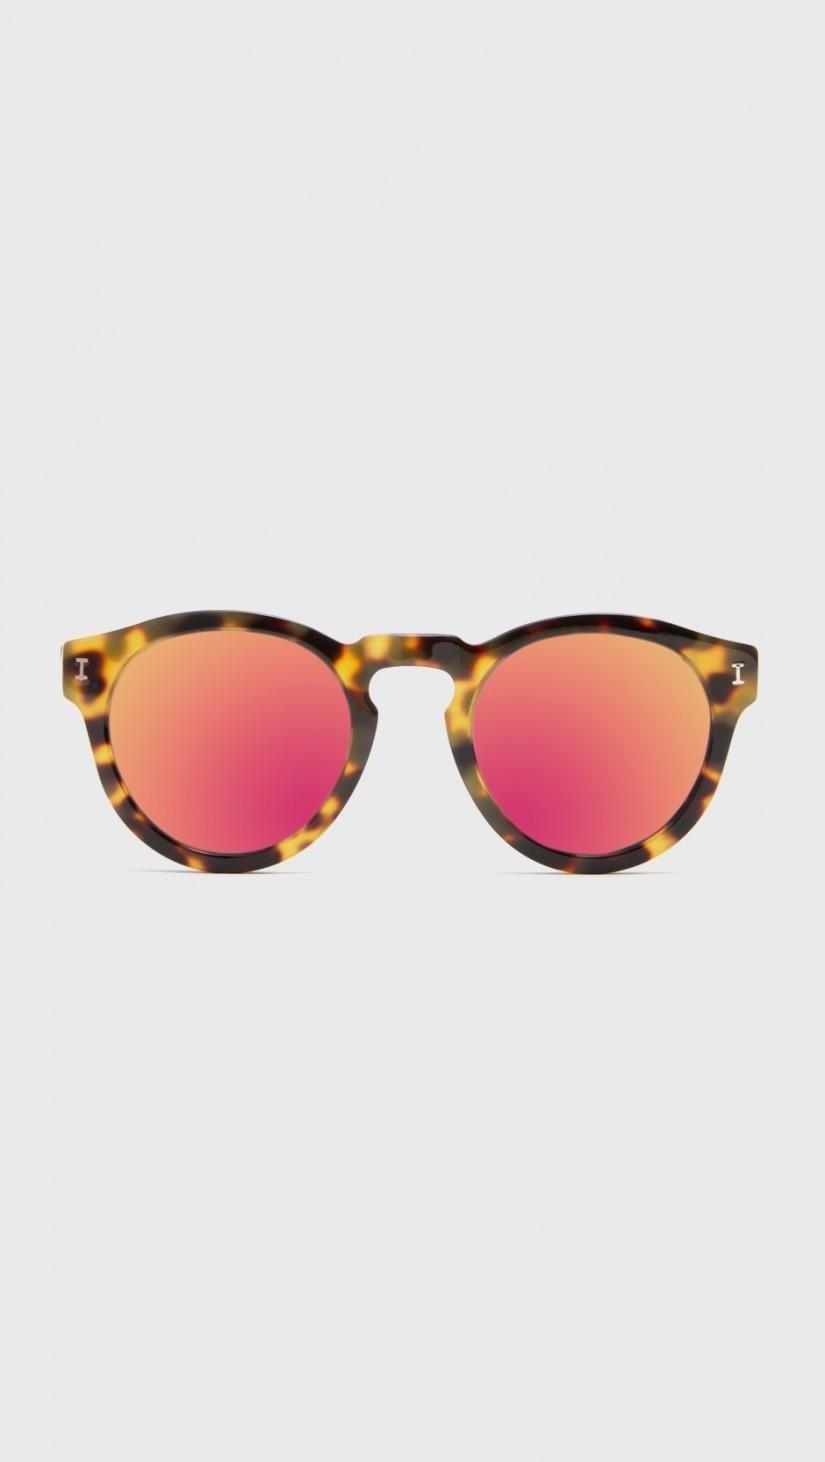 e733f0639c1 Illesteva Leonard Tortoise Pink Mirrored Sunglasses